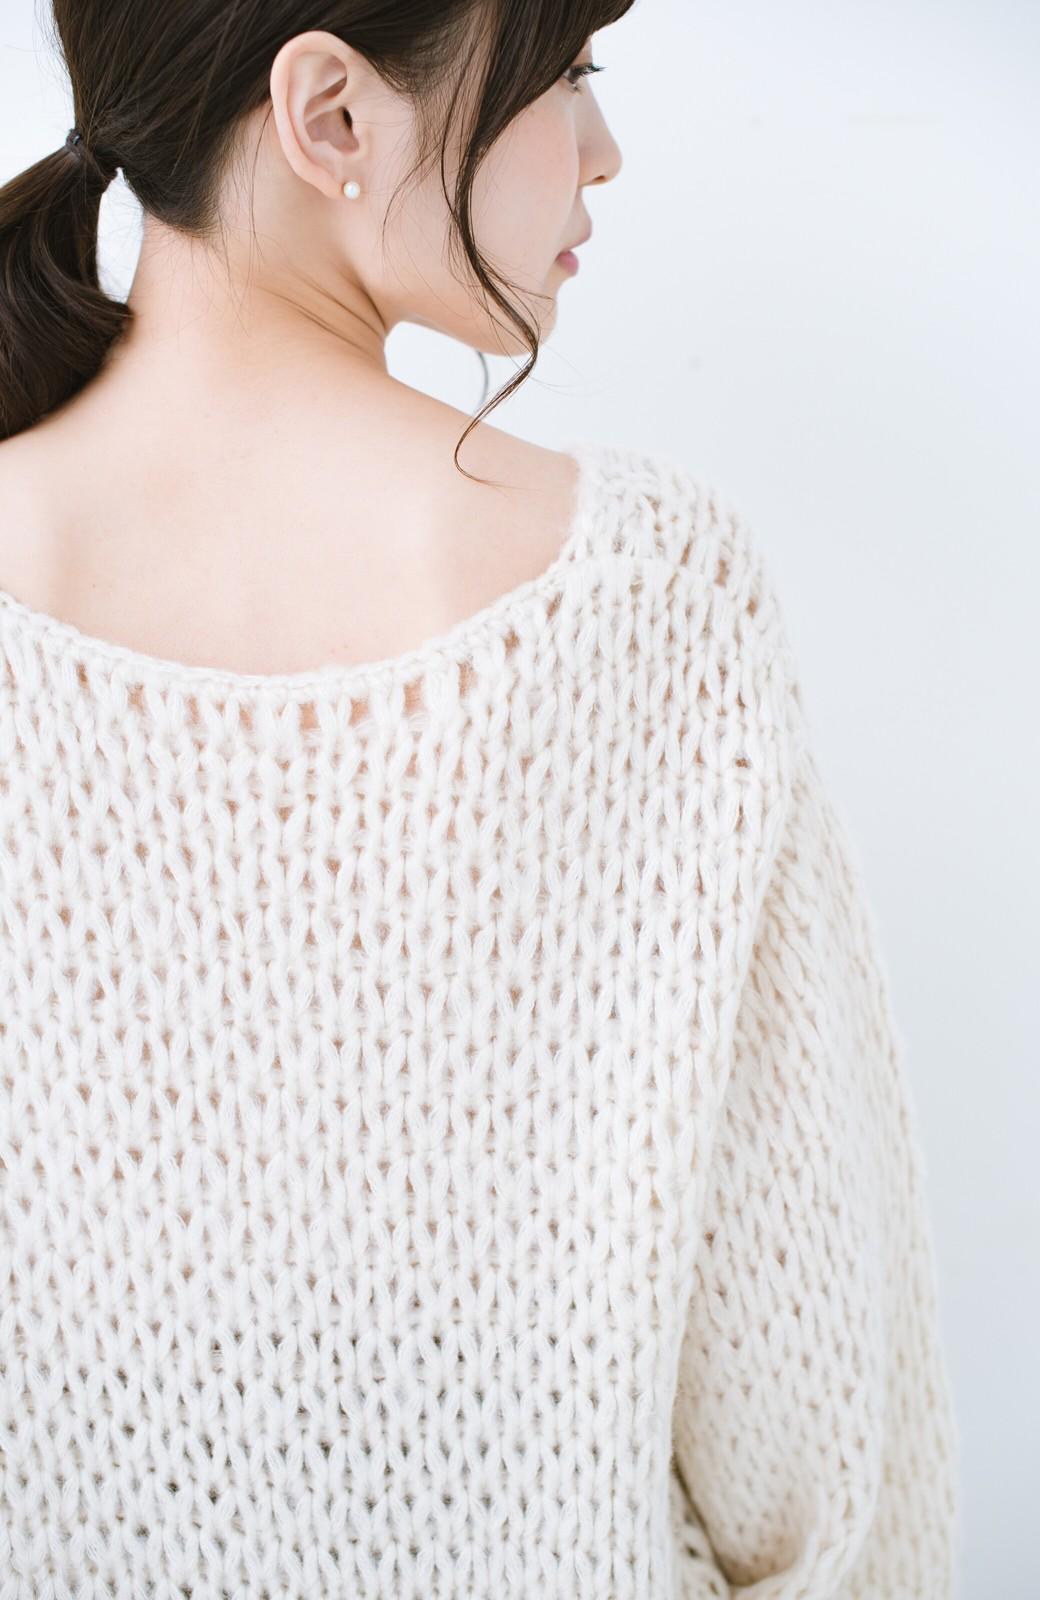 haco! 手編み風のざっくり感で女っぽい Vネックの甘編みルーズニット <アイボリー>の商品写真3